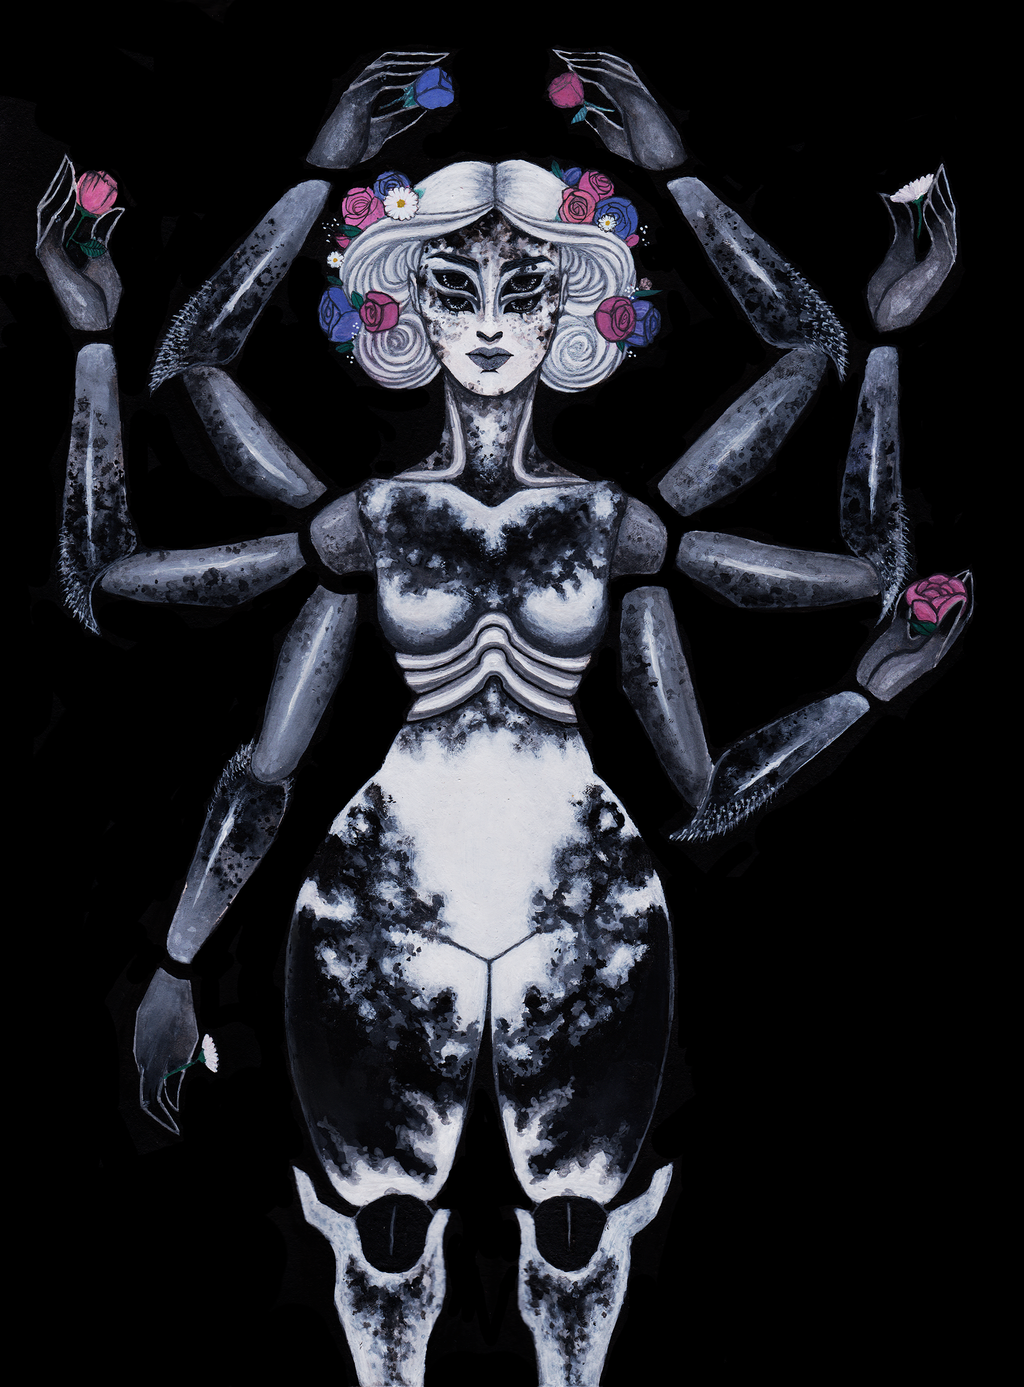 Spider humanoid, 2017 by Viera8